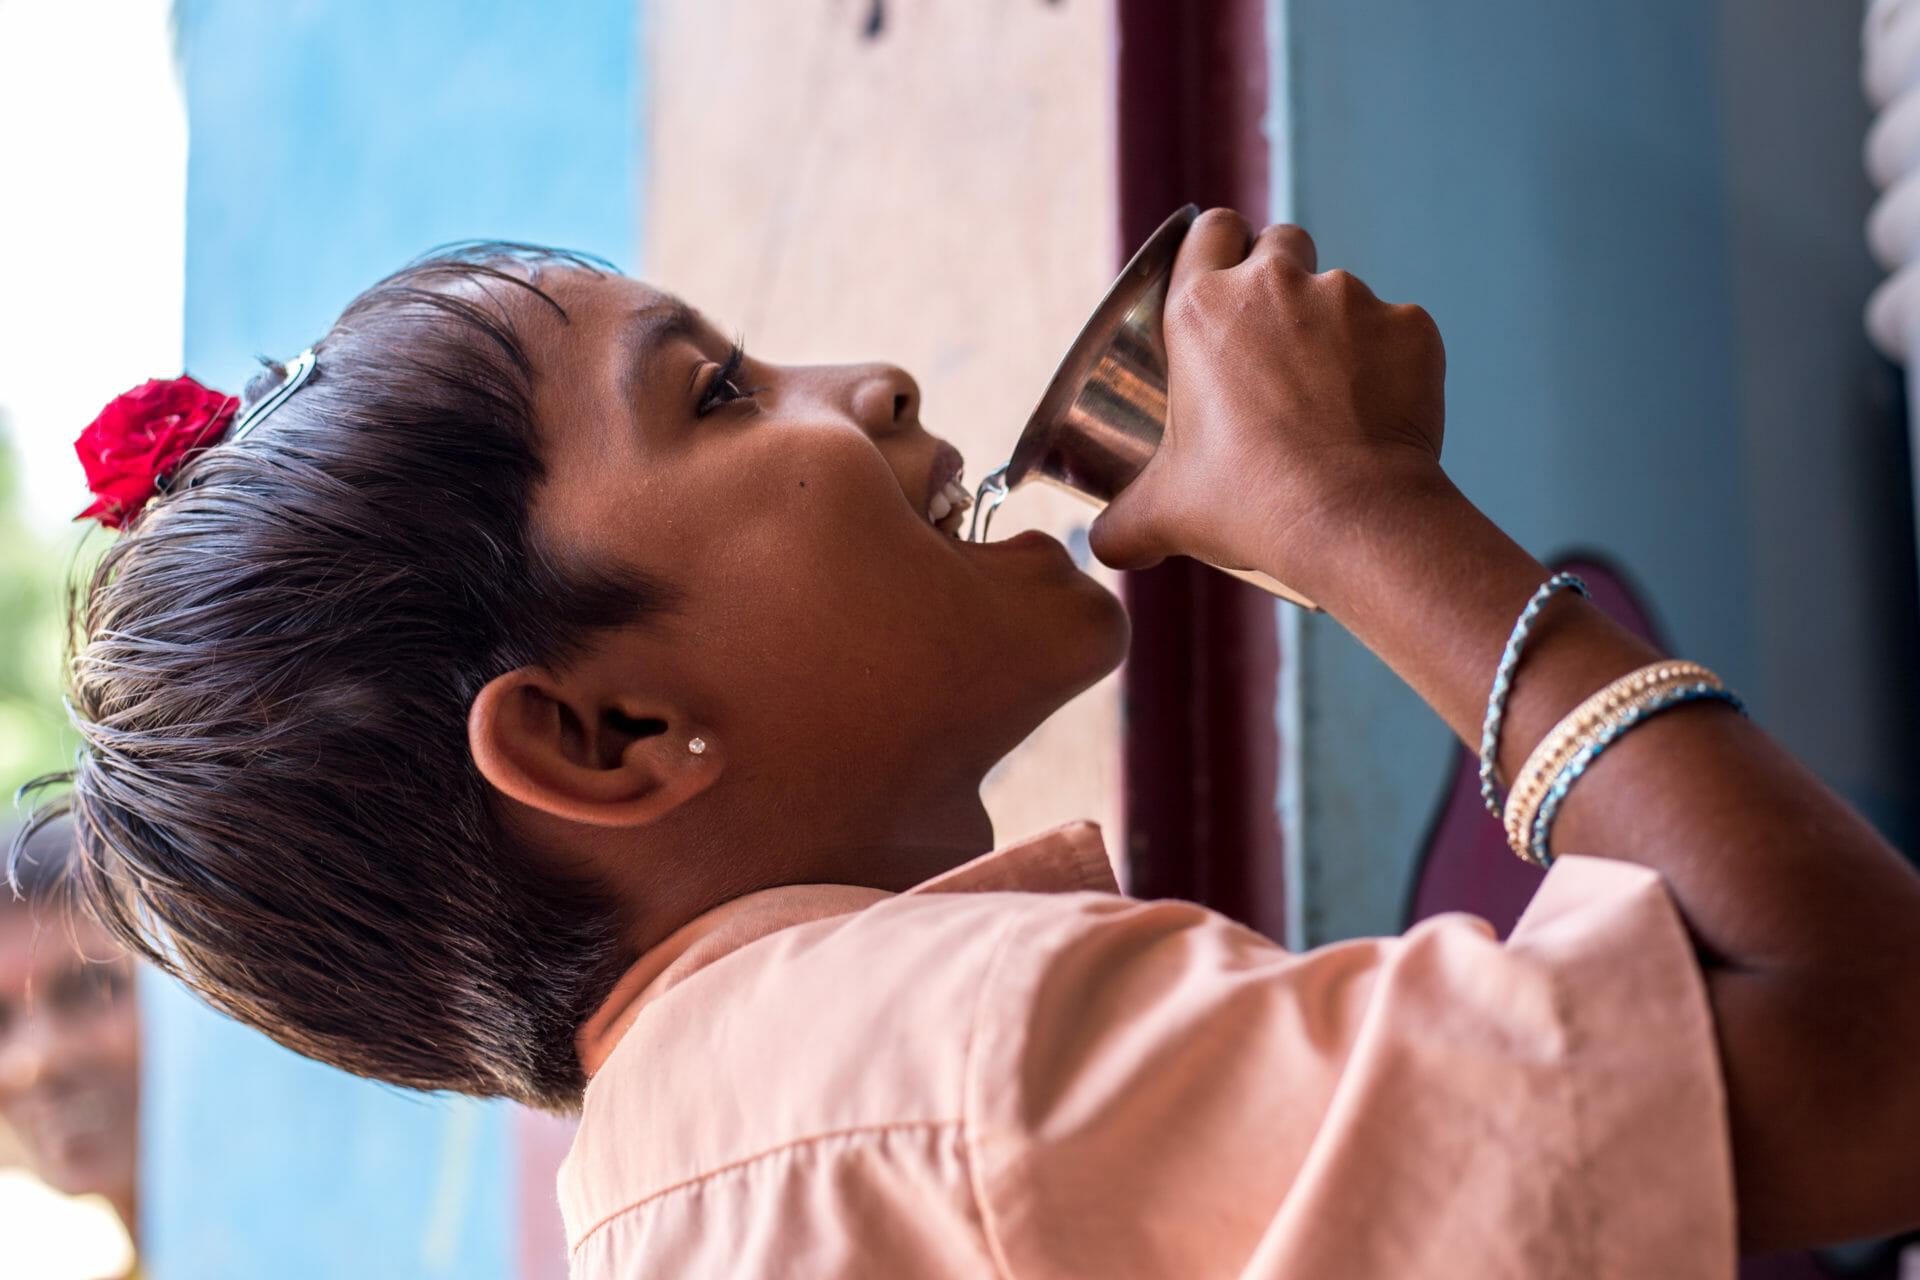 kynarou-association-eau-potable-filtre-inde